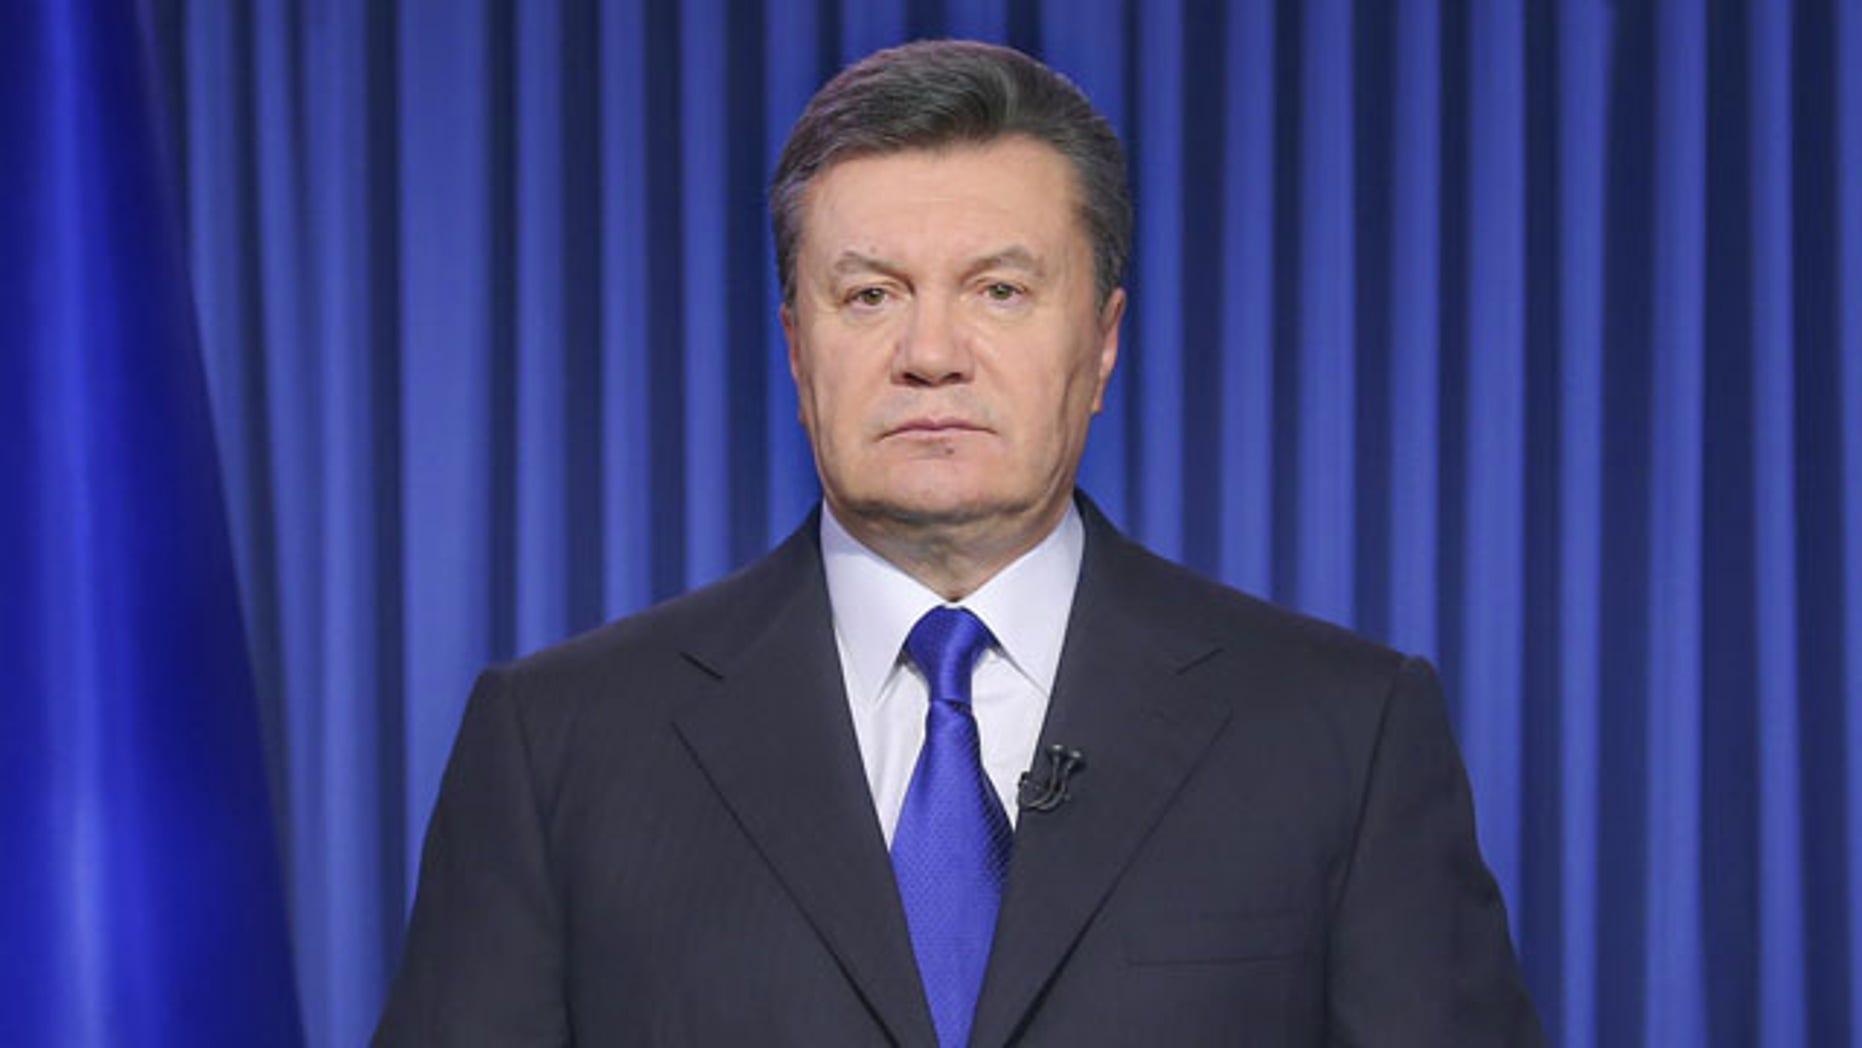 File- This Feb. 19, 2014, file photo shows Ukrainian President Viktor Yanukovych addressing the nation on a live TV broadcast in Kiev, Ukraine. (AP)